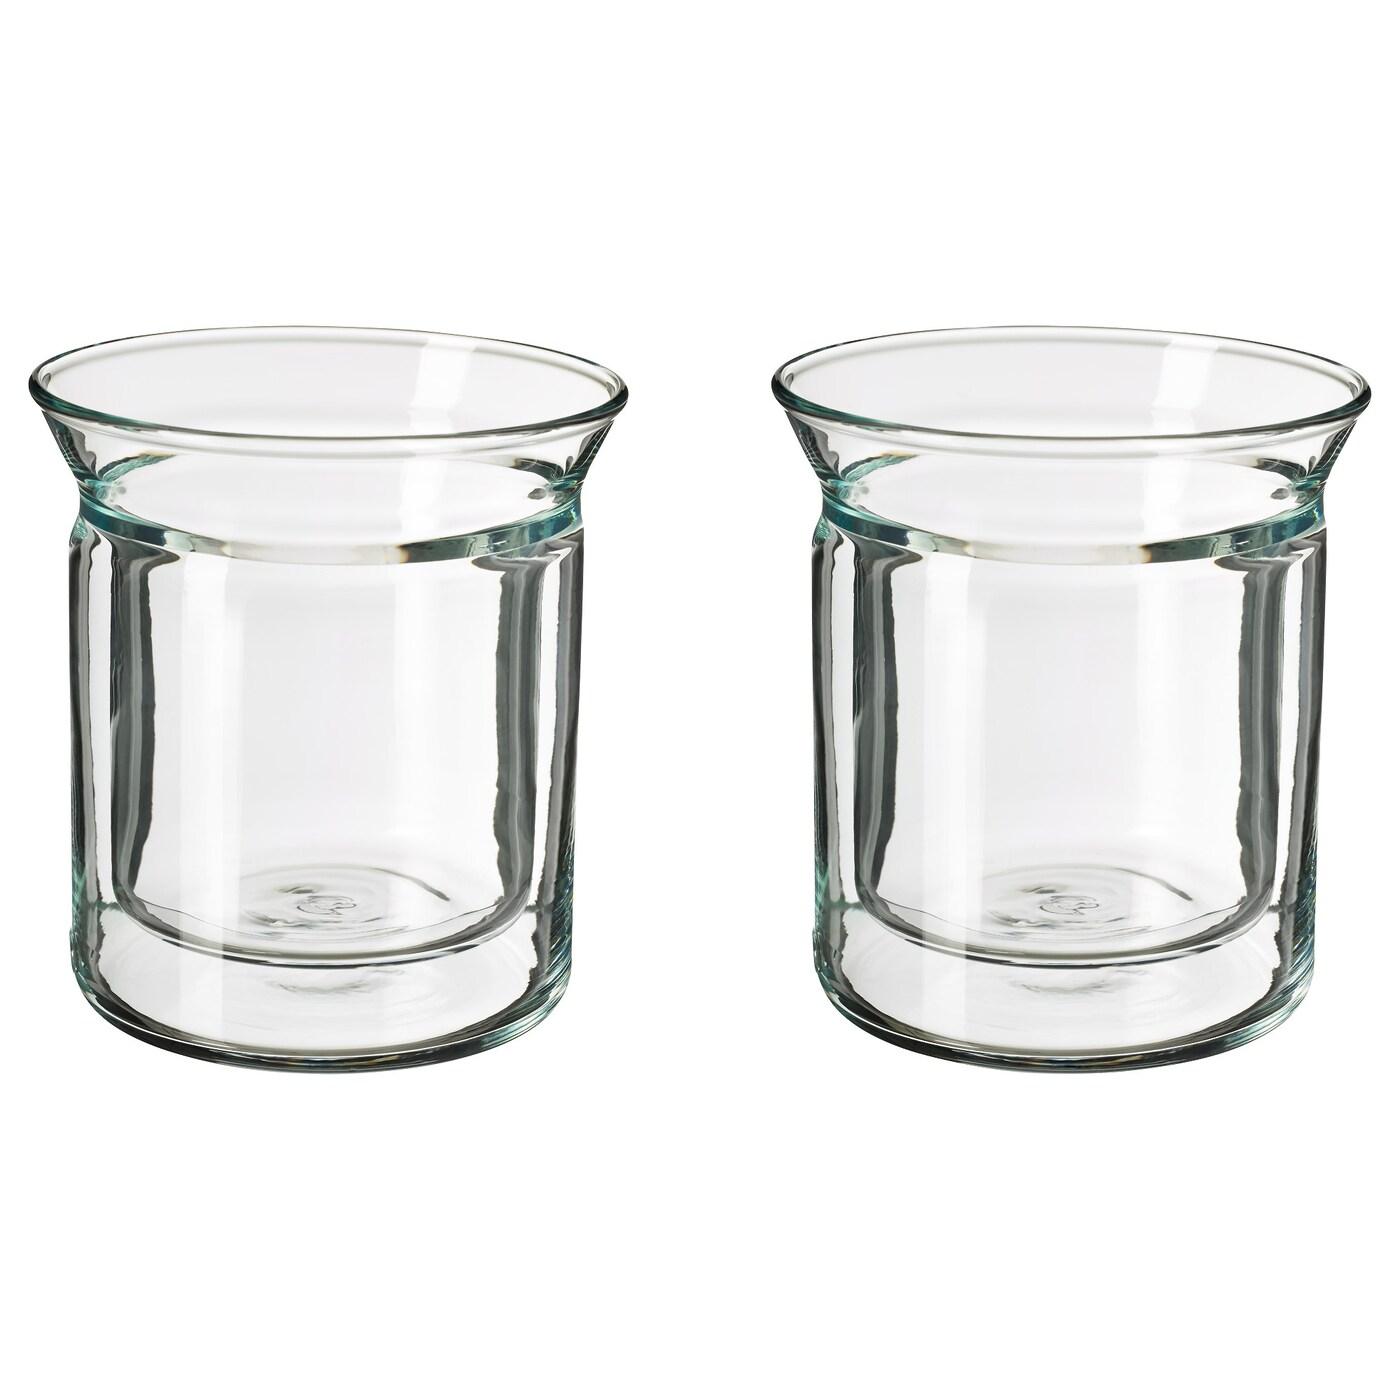 egentlig cafeti re th i re double paroi verre transparent 0 3 l ikea. Black Bedroom Furniture Sets. Home Design Ideas